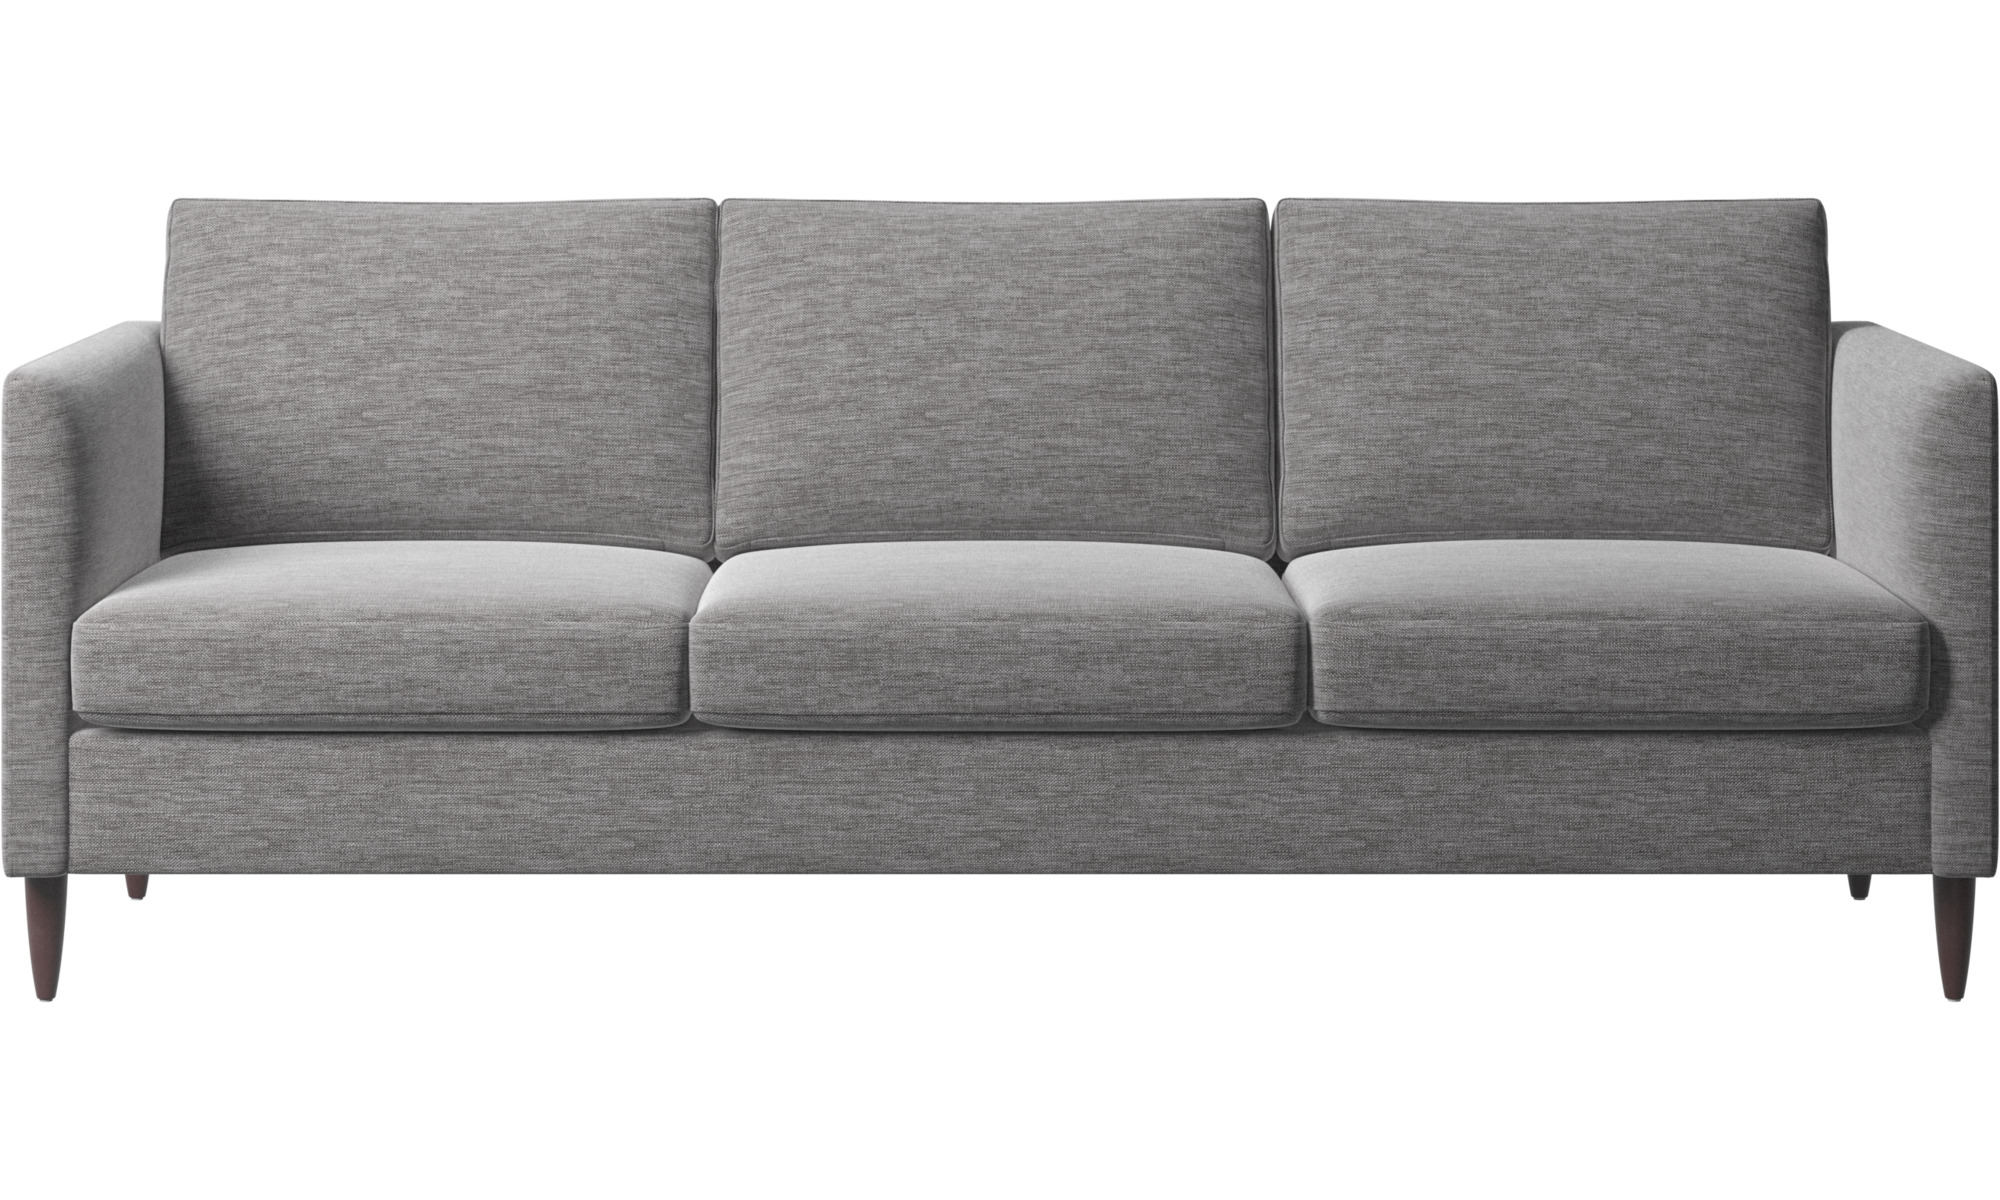 3 personers sofaer - Indivi sofa - Grå - Stof